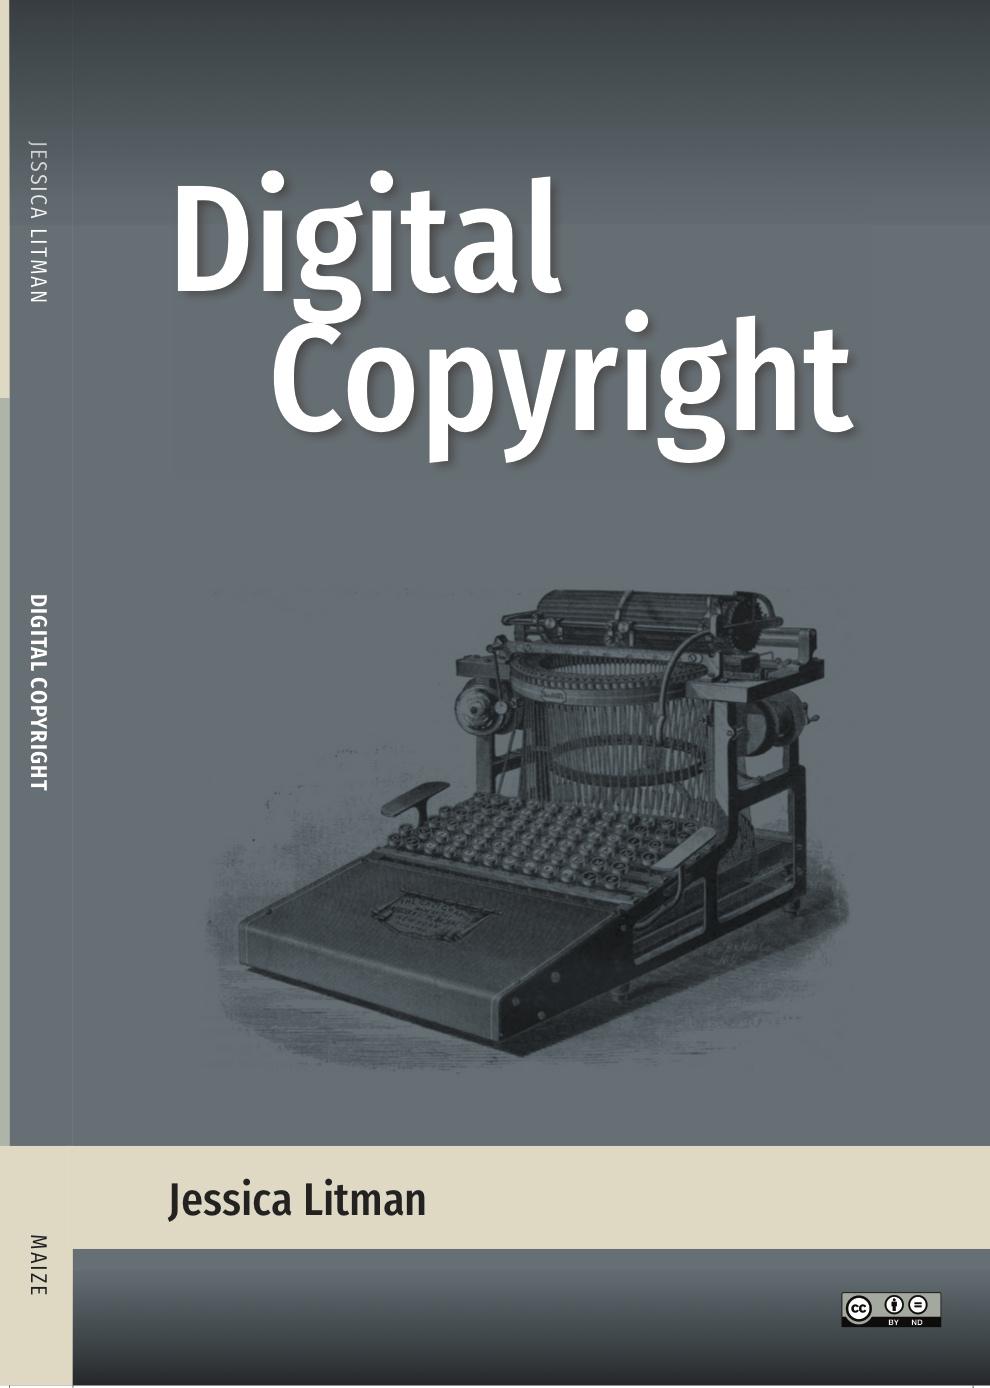 Digital Copyright (2017)